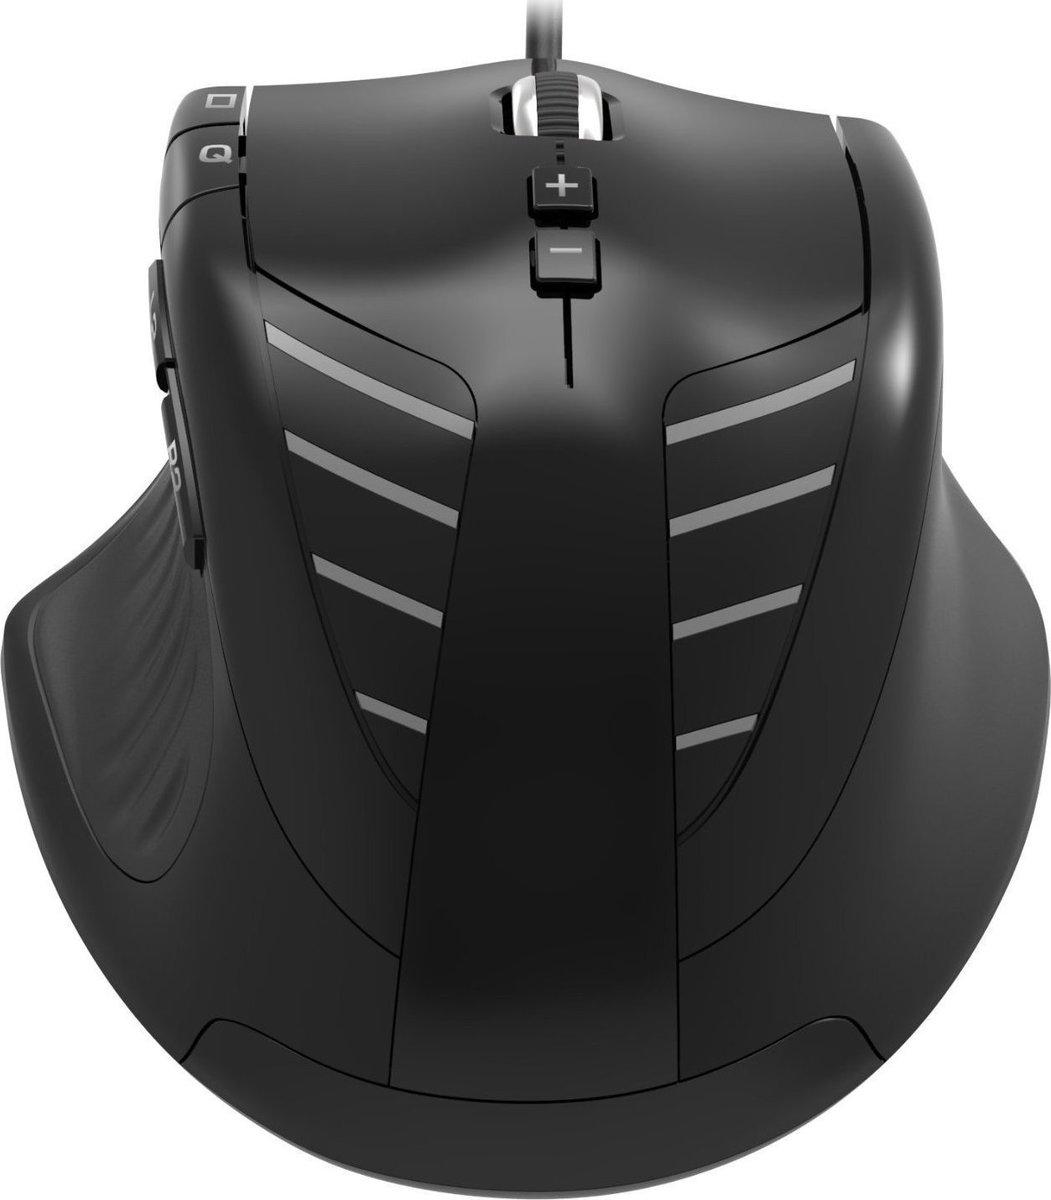 Hori Tactical Assault Commander 4 Ps4 Grip Controller Type G1 For 3